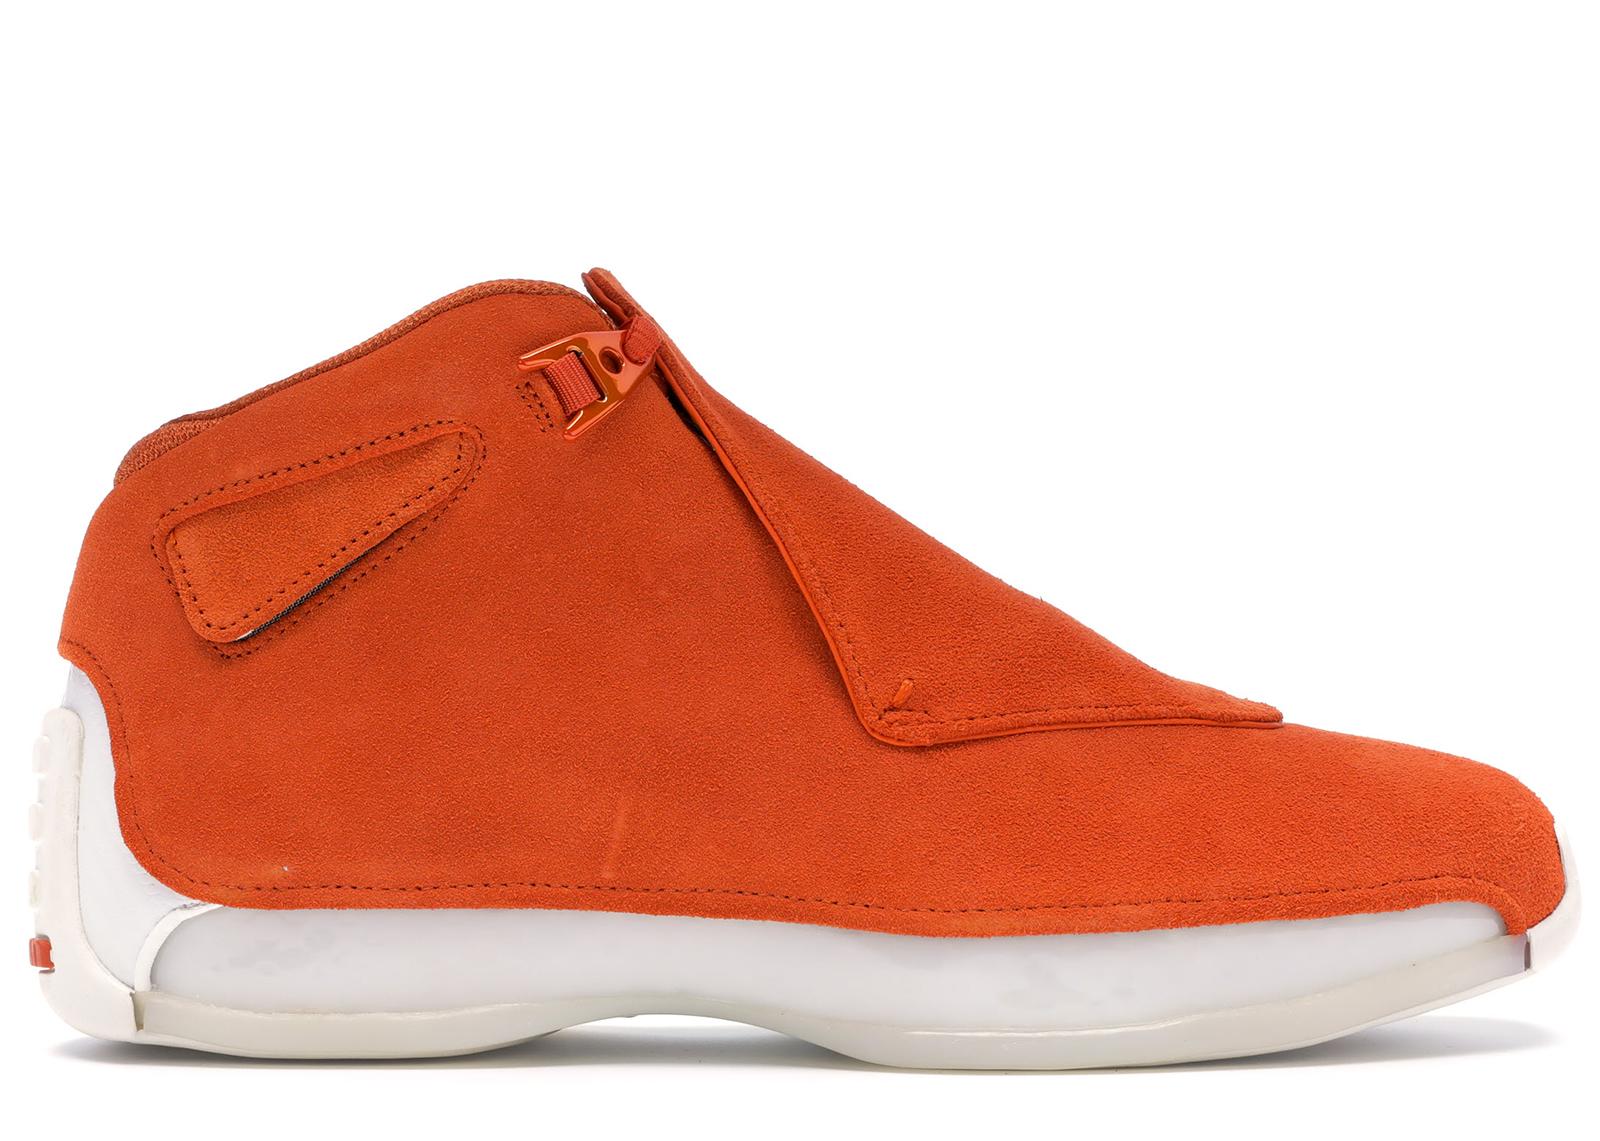 Jordan 18 Retro Campfire Orange